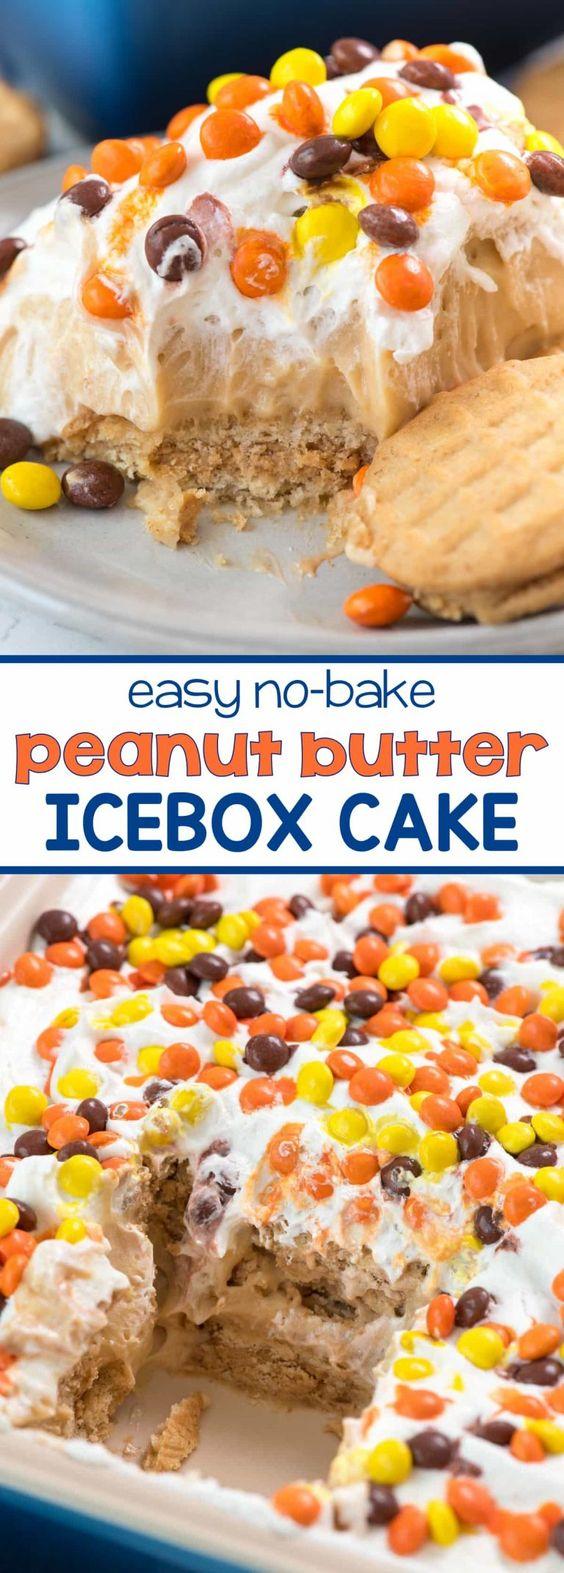 No Bake Peanut Butter Icebox Cake